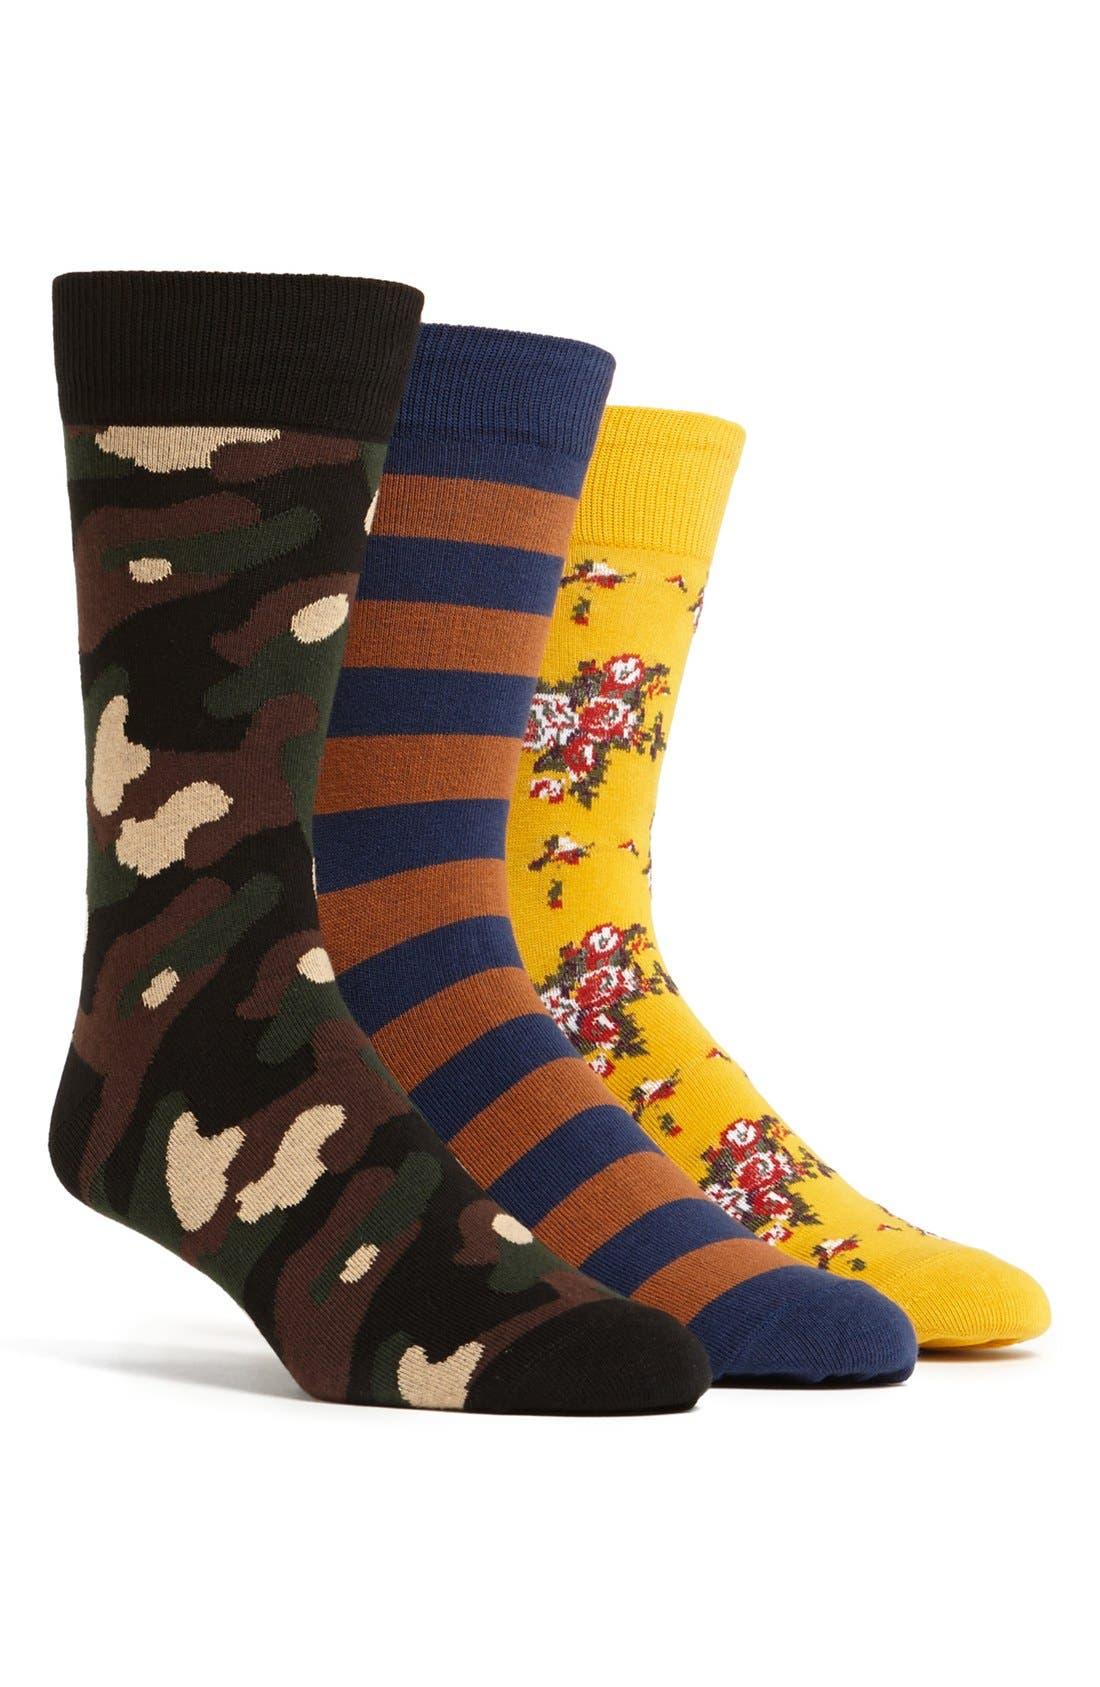 Main Image - Richer Poorer 'The Long Weekend' Socks Gift Set (3-Pack)